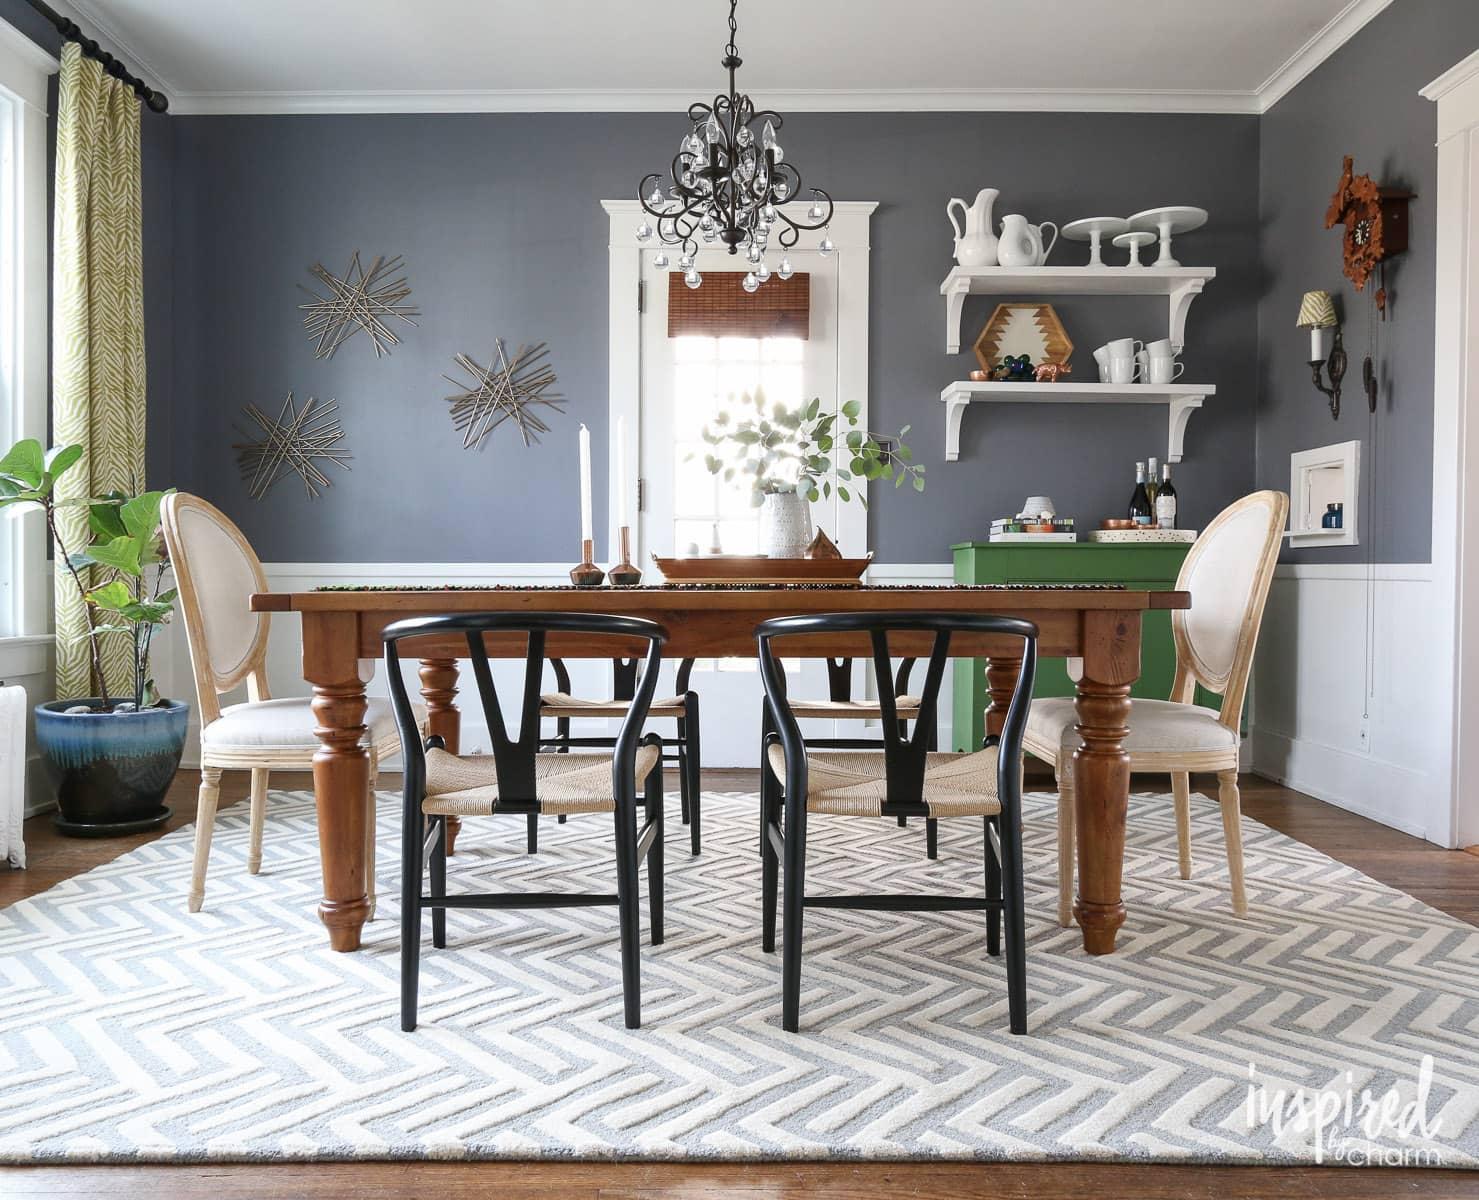 living room rugs modern interior design black and white new rug for the dining inspiredbycharm com